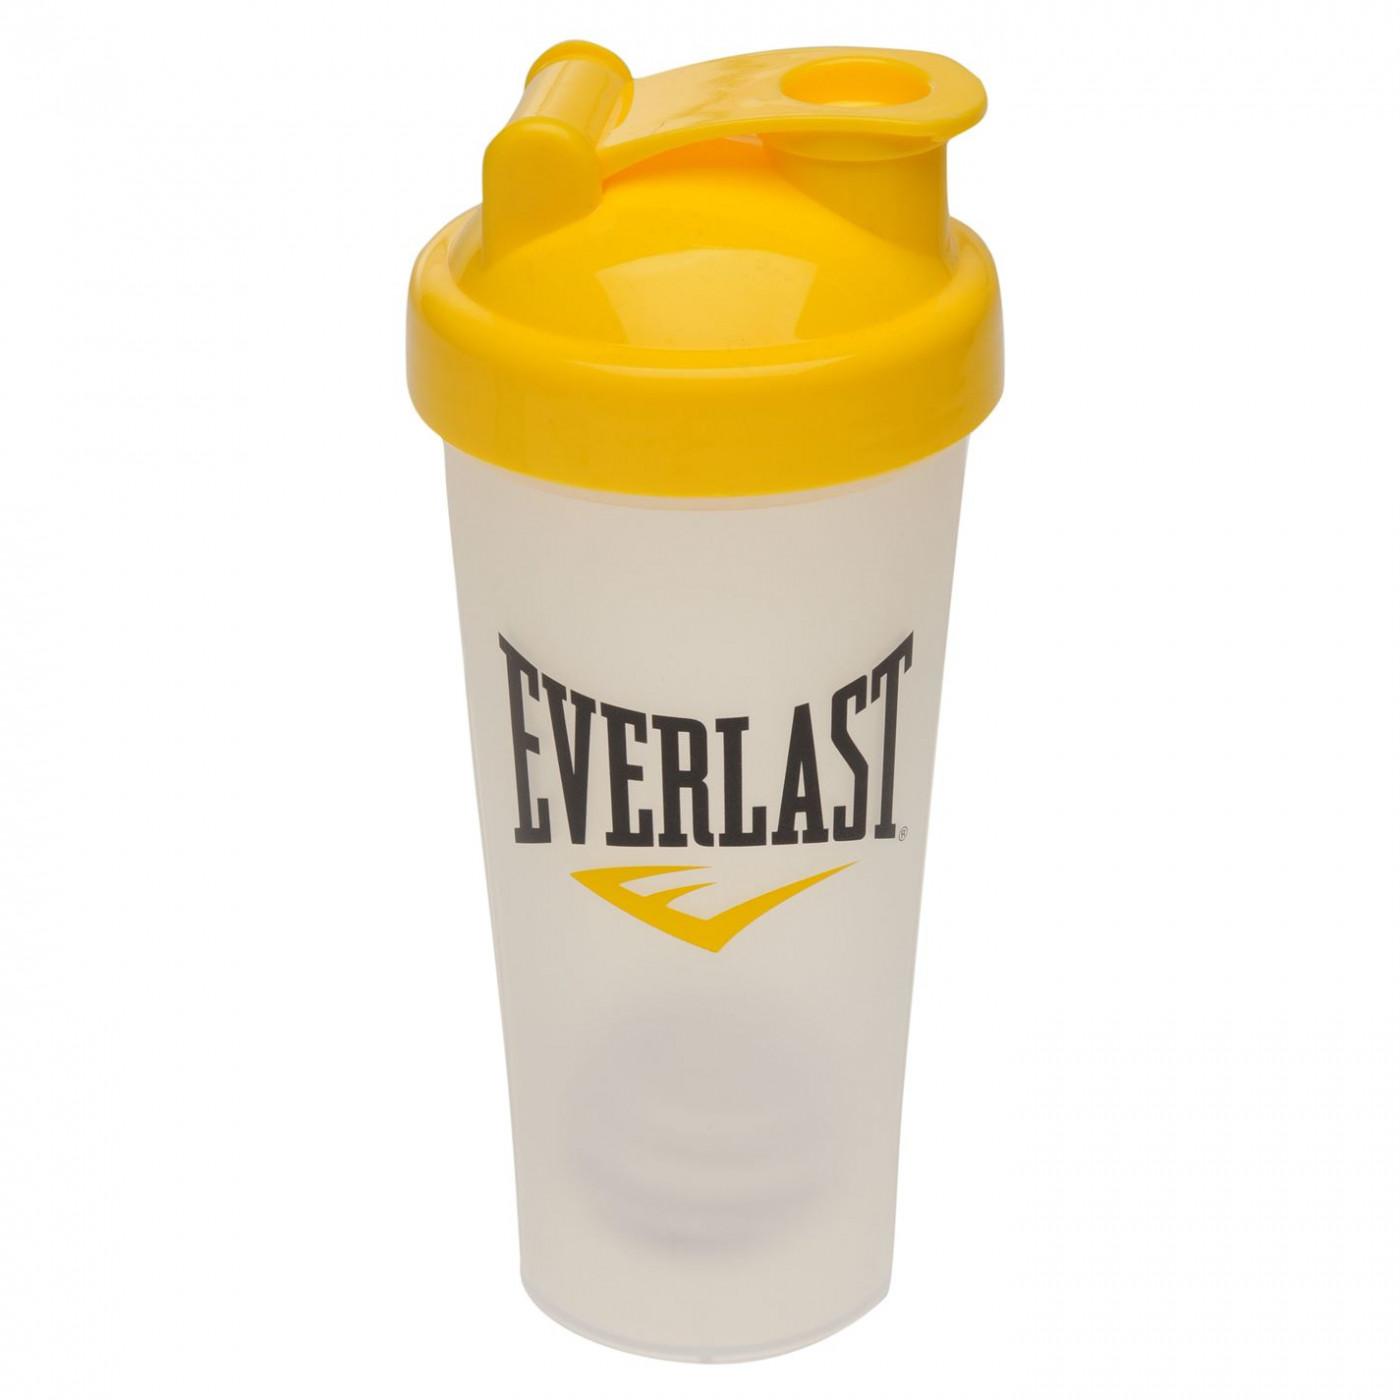 Everlast Vintage Shaker Bottle